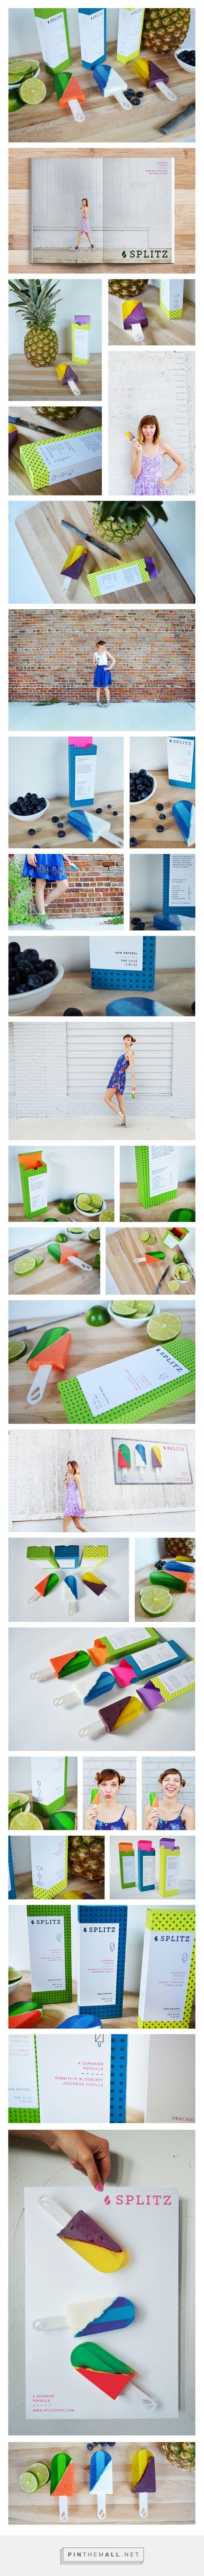 Splitz Popsicles by Wylee Sanderson, UCO Dept. of Design